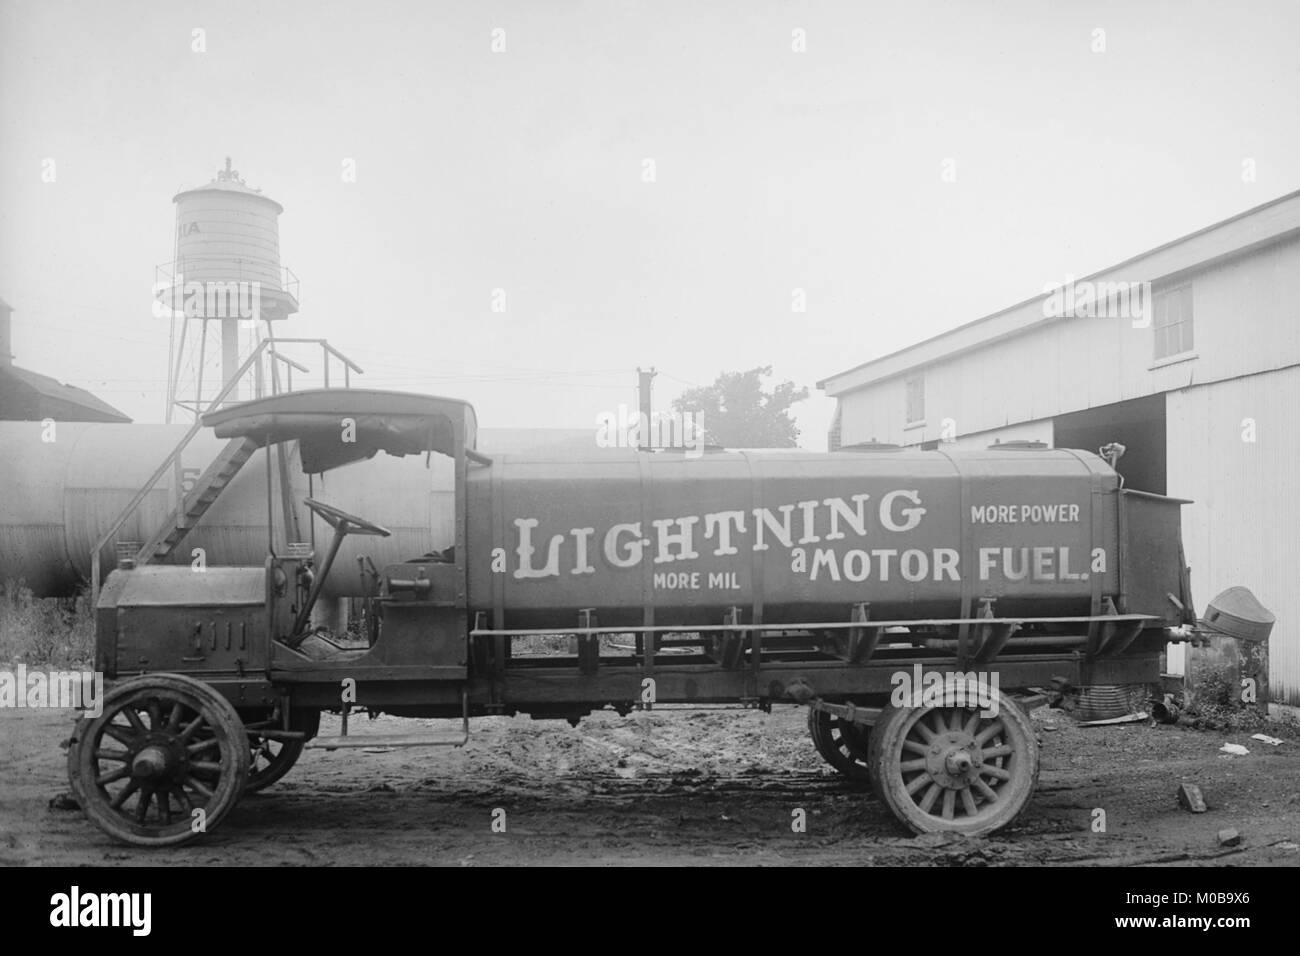 Motor Oil Advertisement Stock Photos & Motor Oil